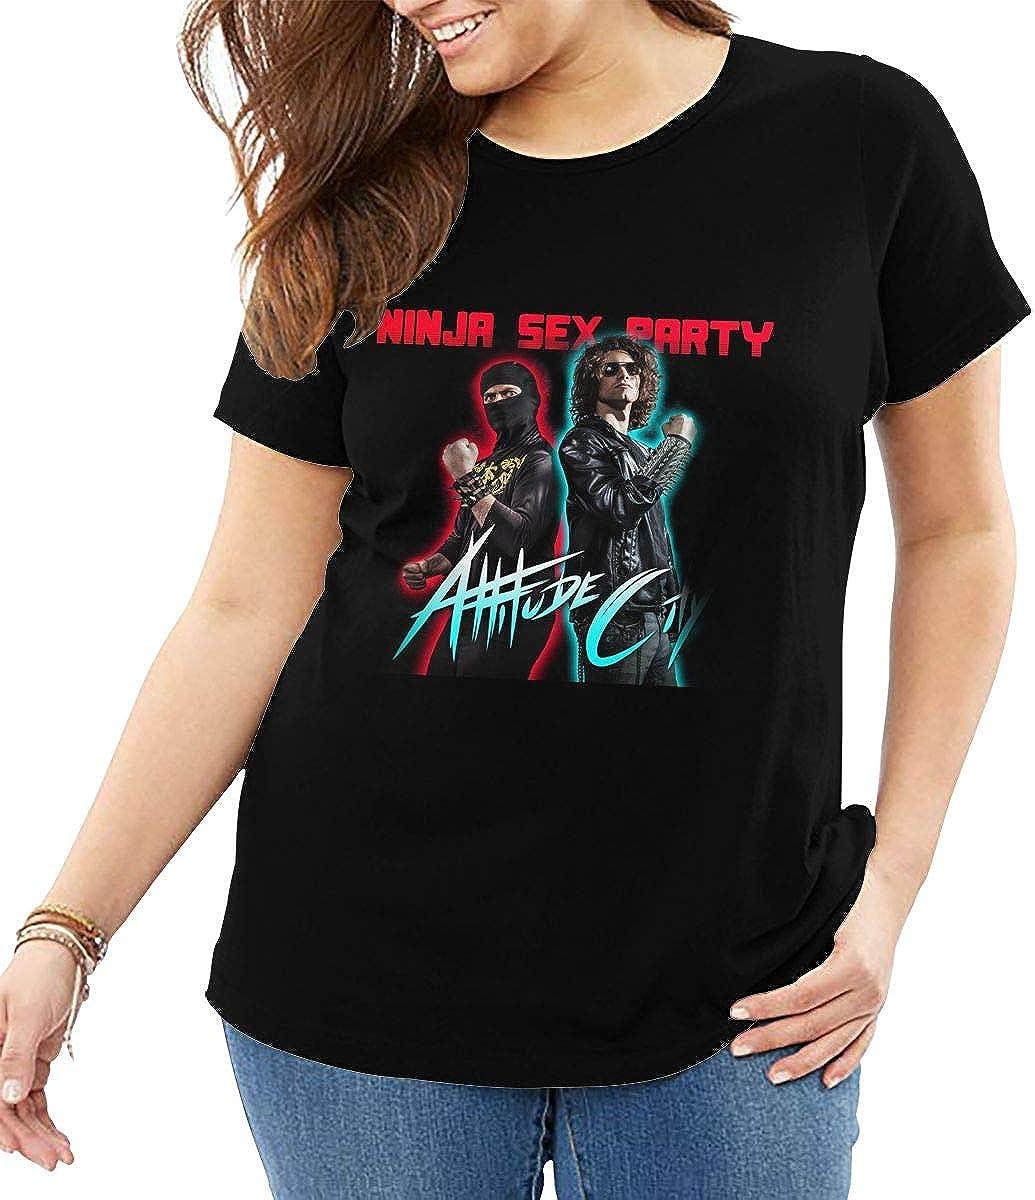 Ninja Sex Party Women's Oversize Shirt Short Sleeve T-Shirt Plus Size Tee